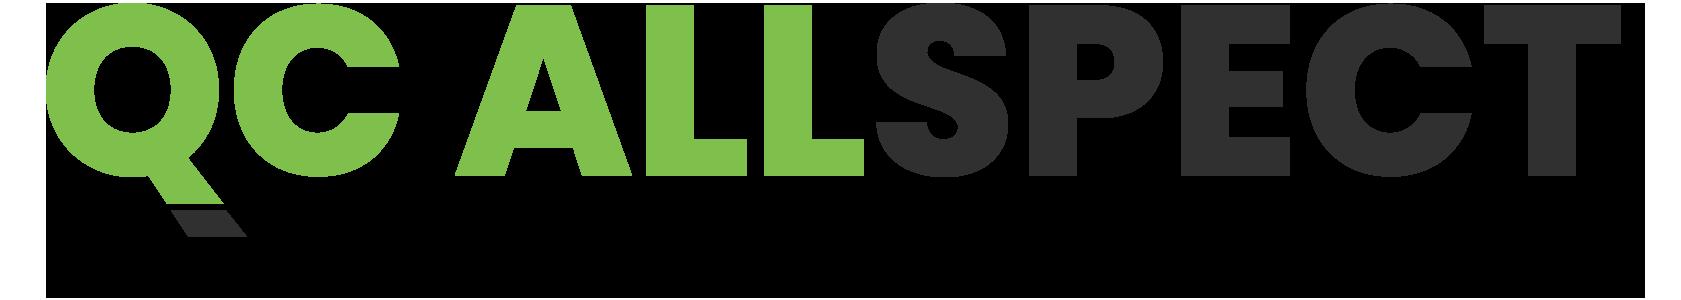 QC Allspect Logo